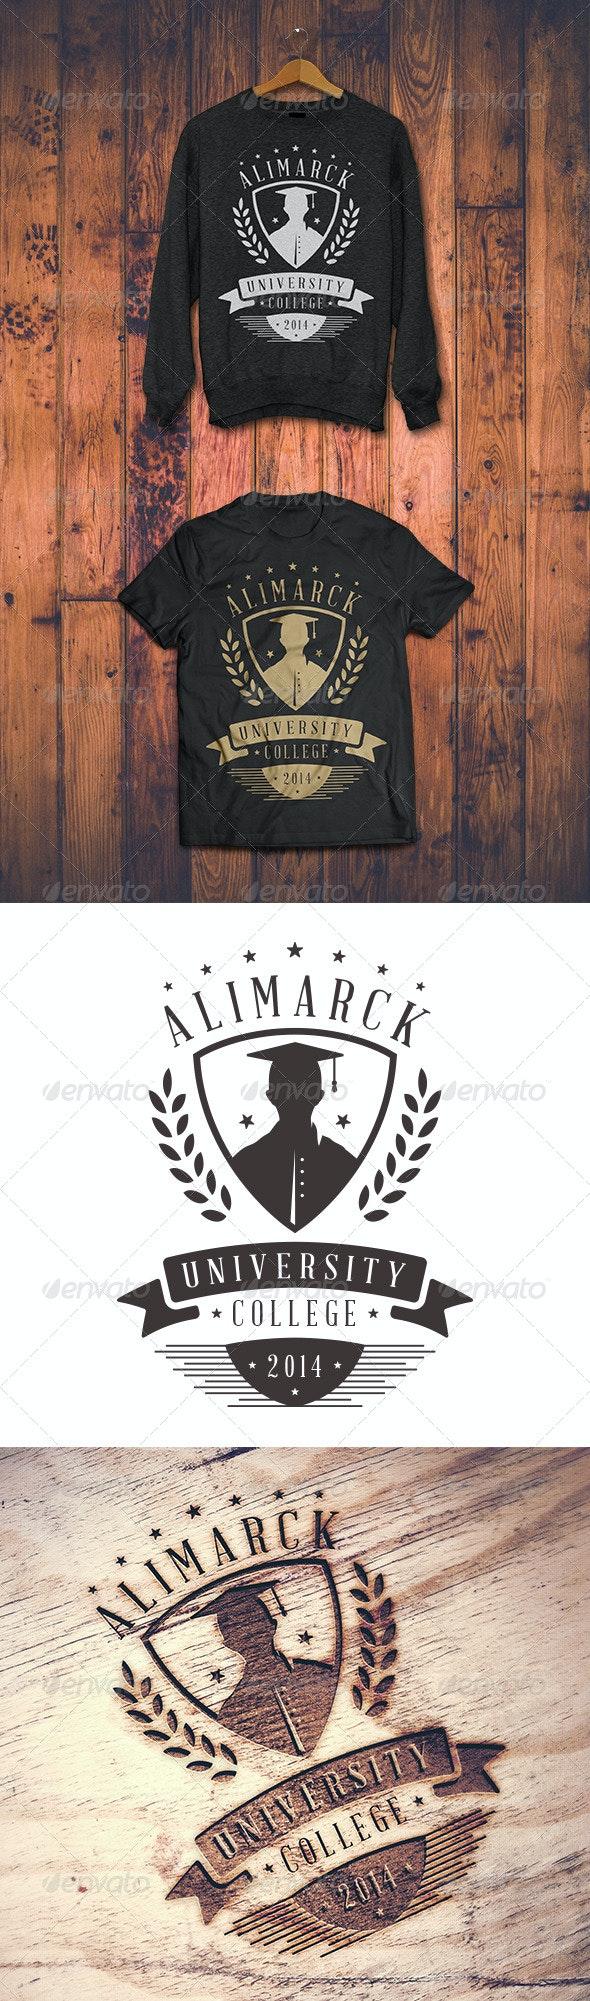 University T-shirt - Academic T-Shirts